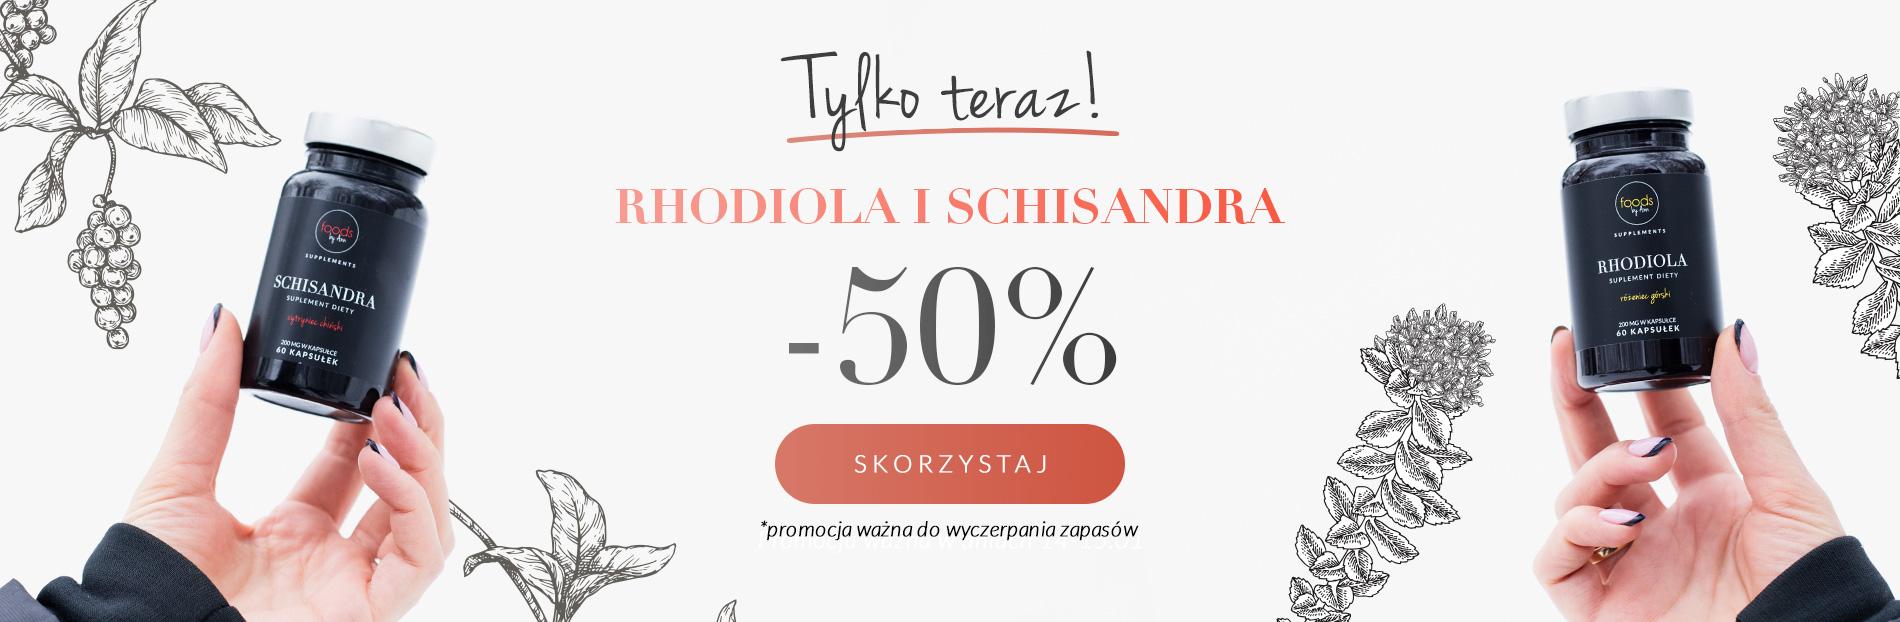 Foods by Ann Foods by Ann: 50% rabatu na suplementy diety Rhodiola i Schisandra